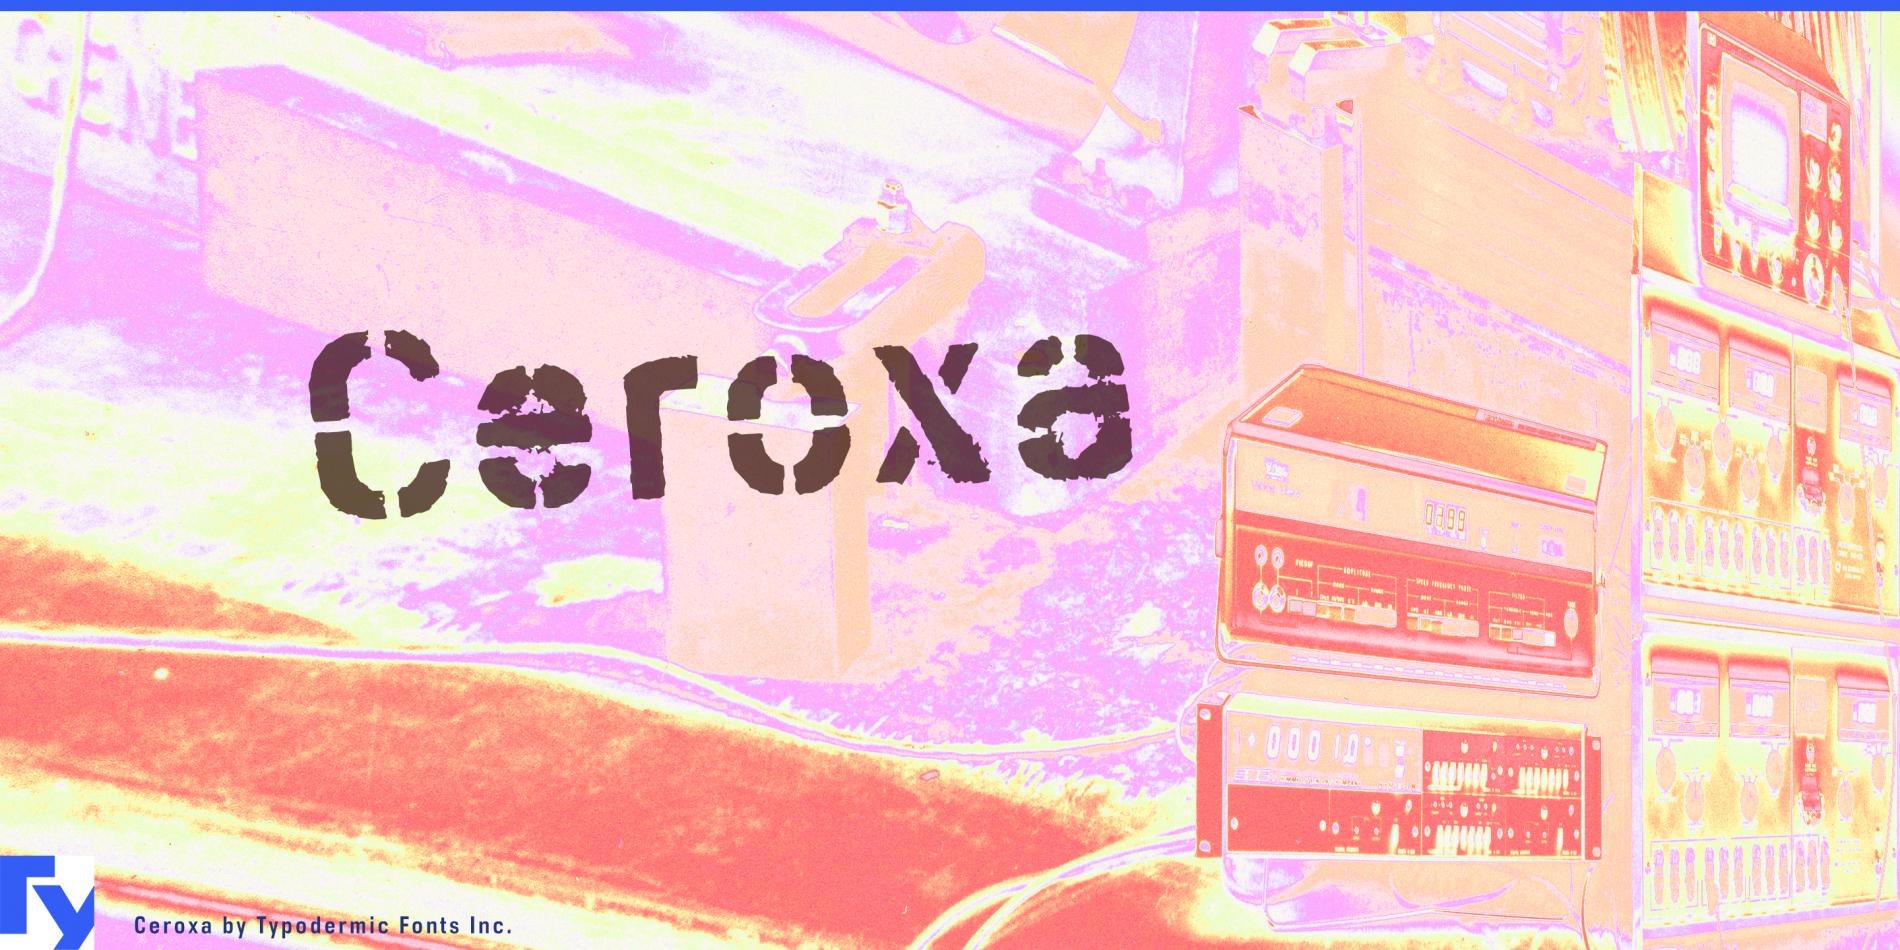 Ceroxa